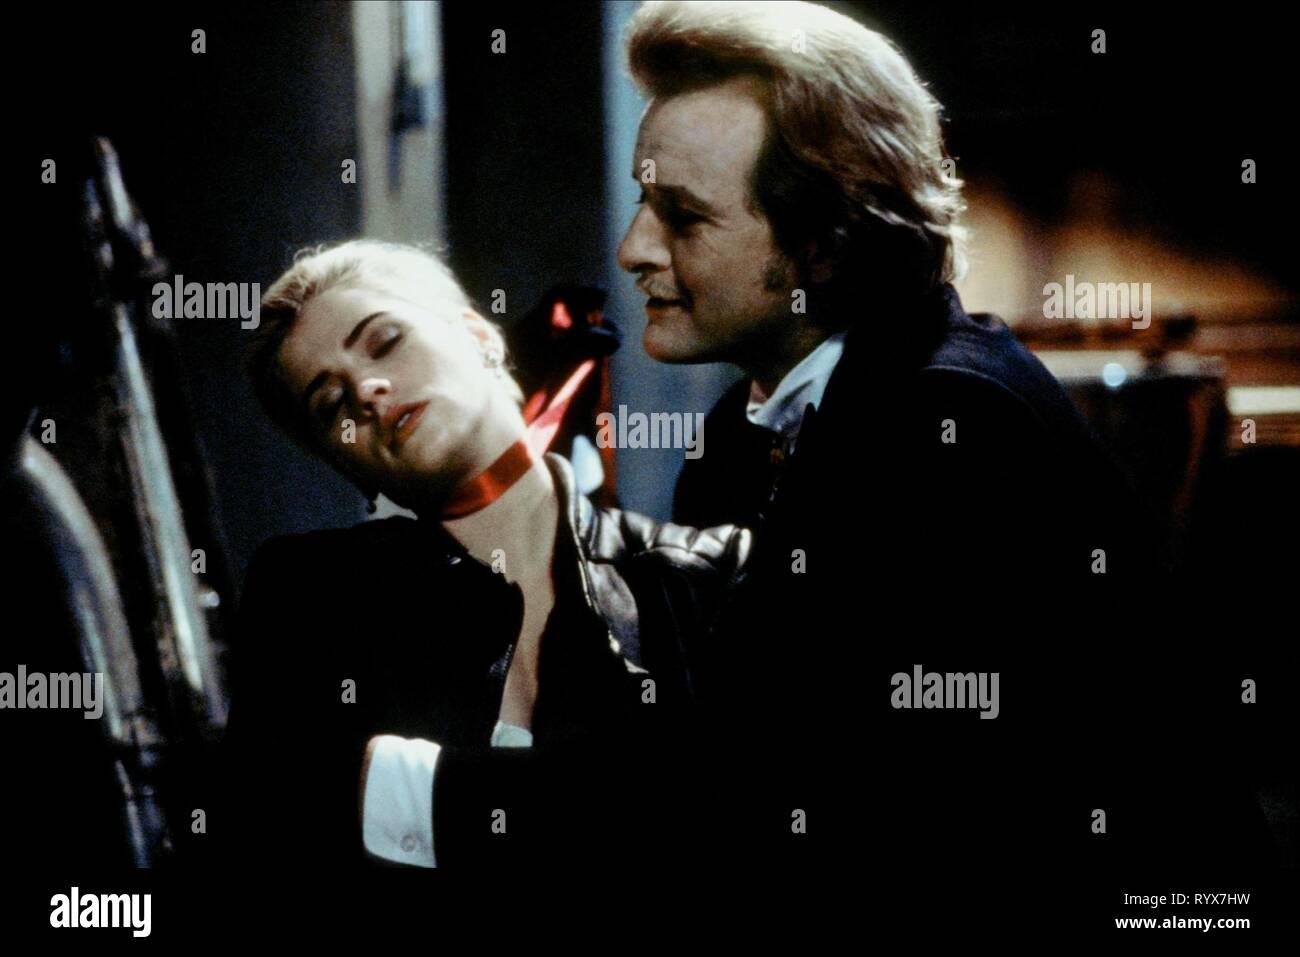 SWANSON,HAUER, BUFFY THE VAMPIRE SLAYER, 1992 - Stock Image